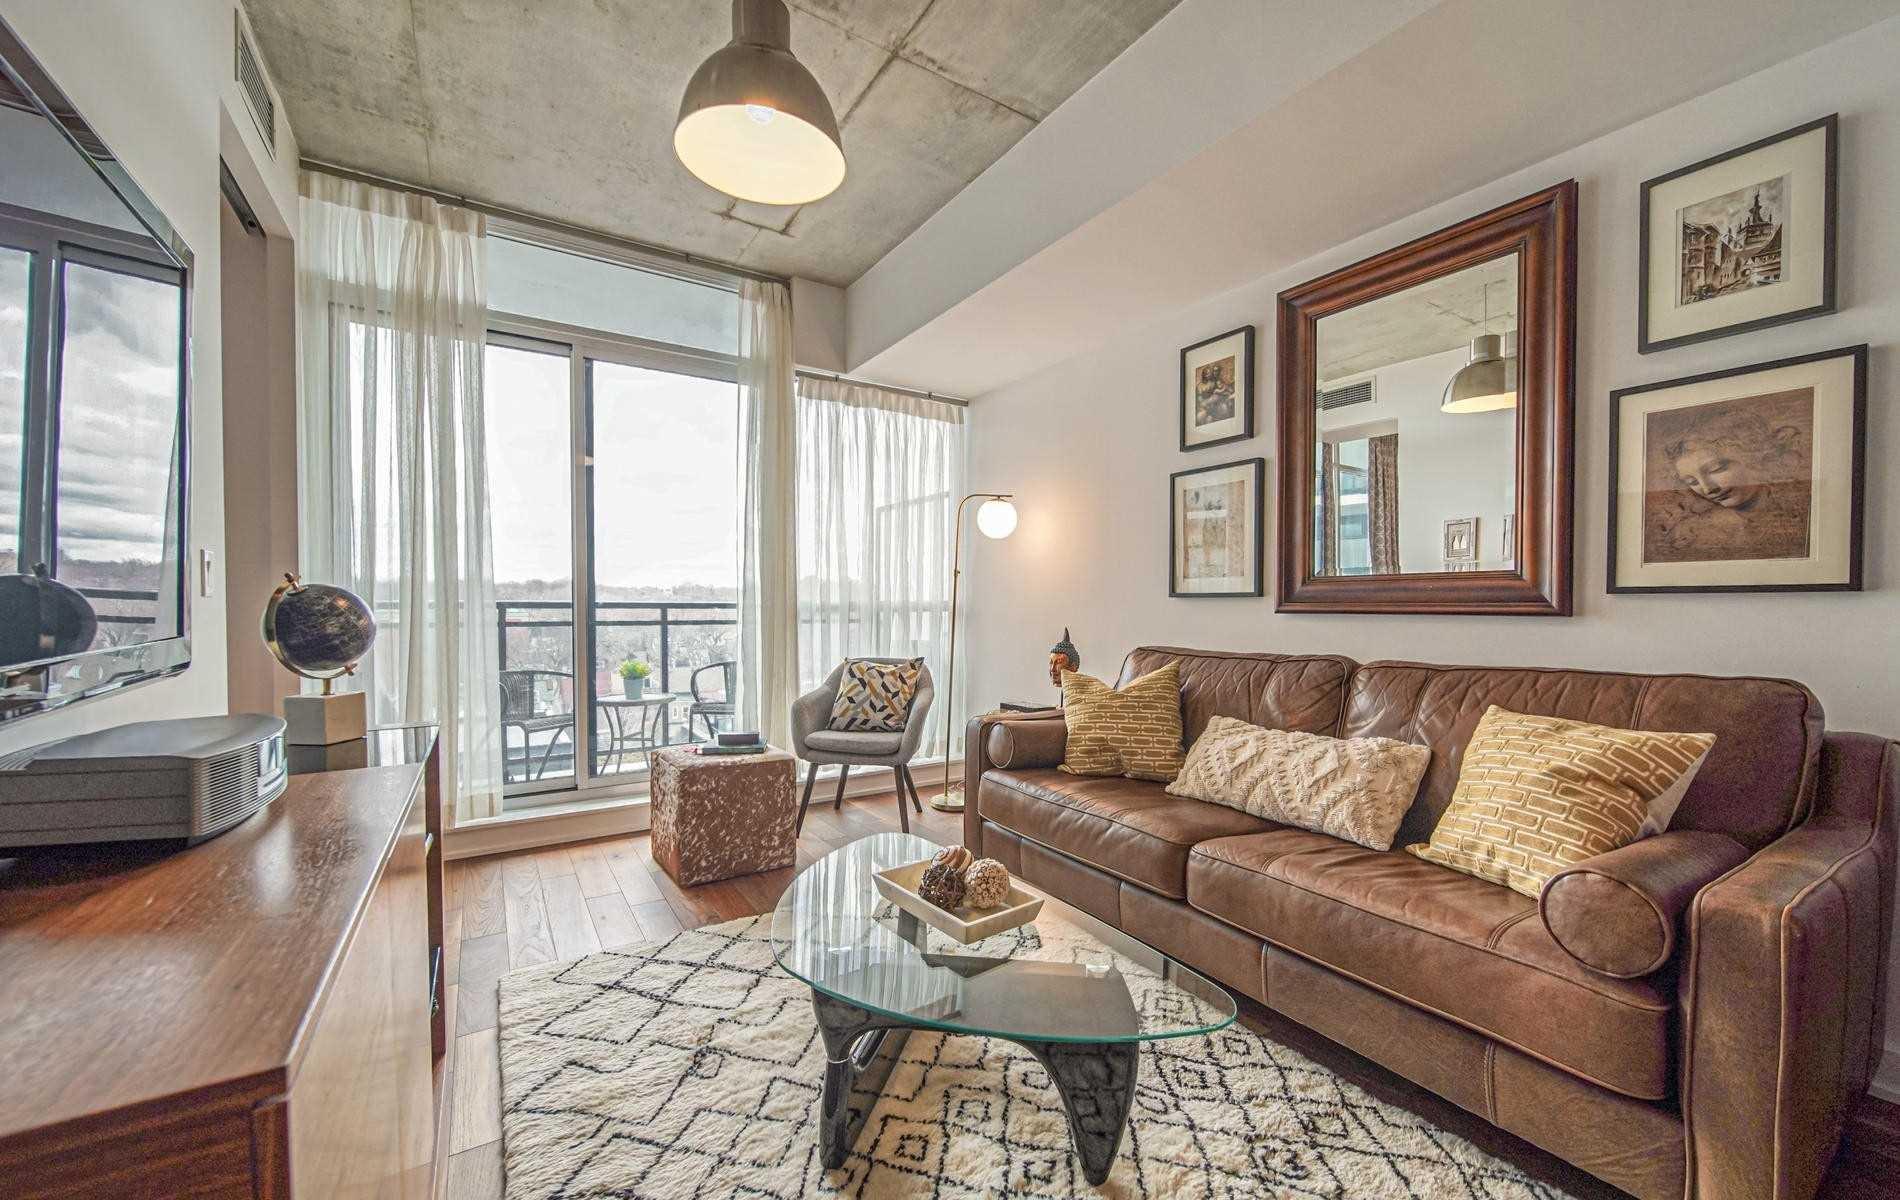 Main Photo: 702 1190 E Dundas Street in Toronto: South Riverdale Condo for sale (Toronto E01)  : MLS®# E4766173